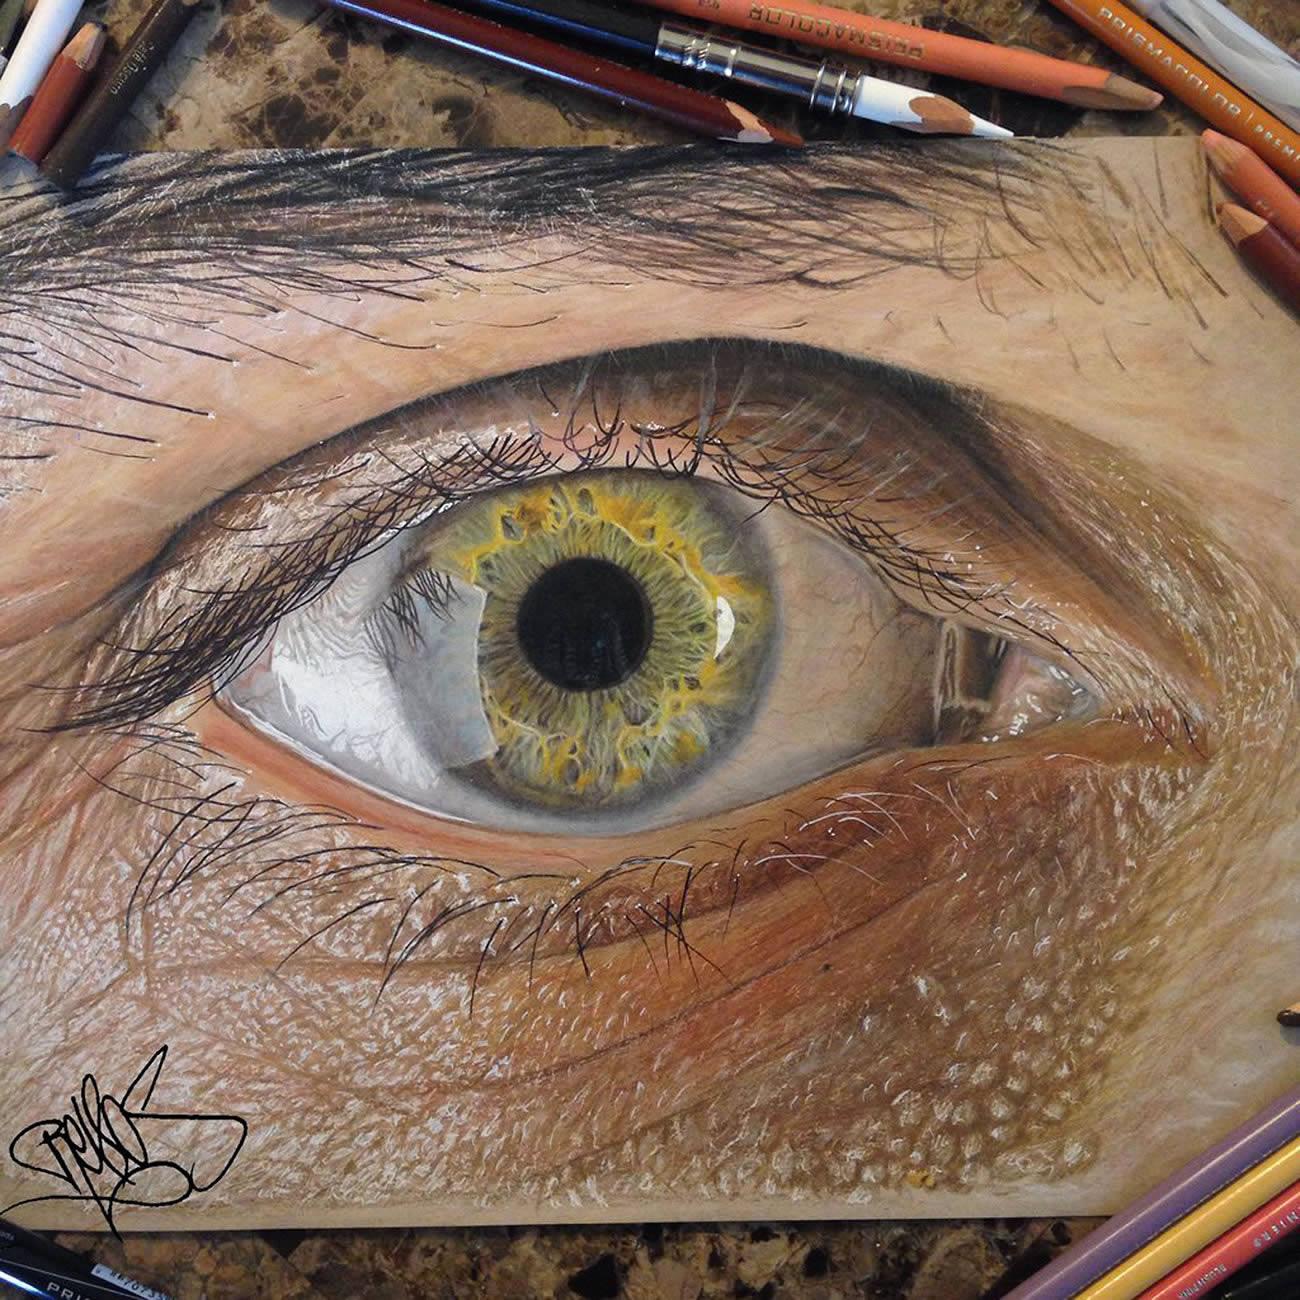 Drawn eyeball photorealistic By Eye Drawings Drawings Photorealistic